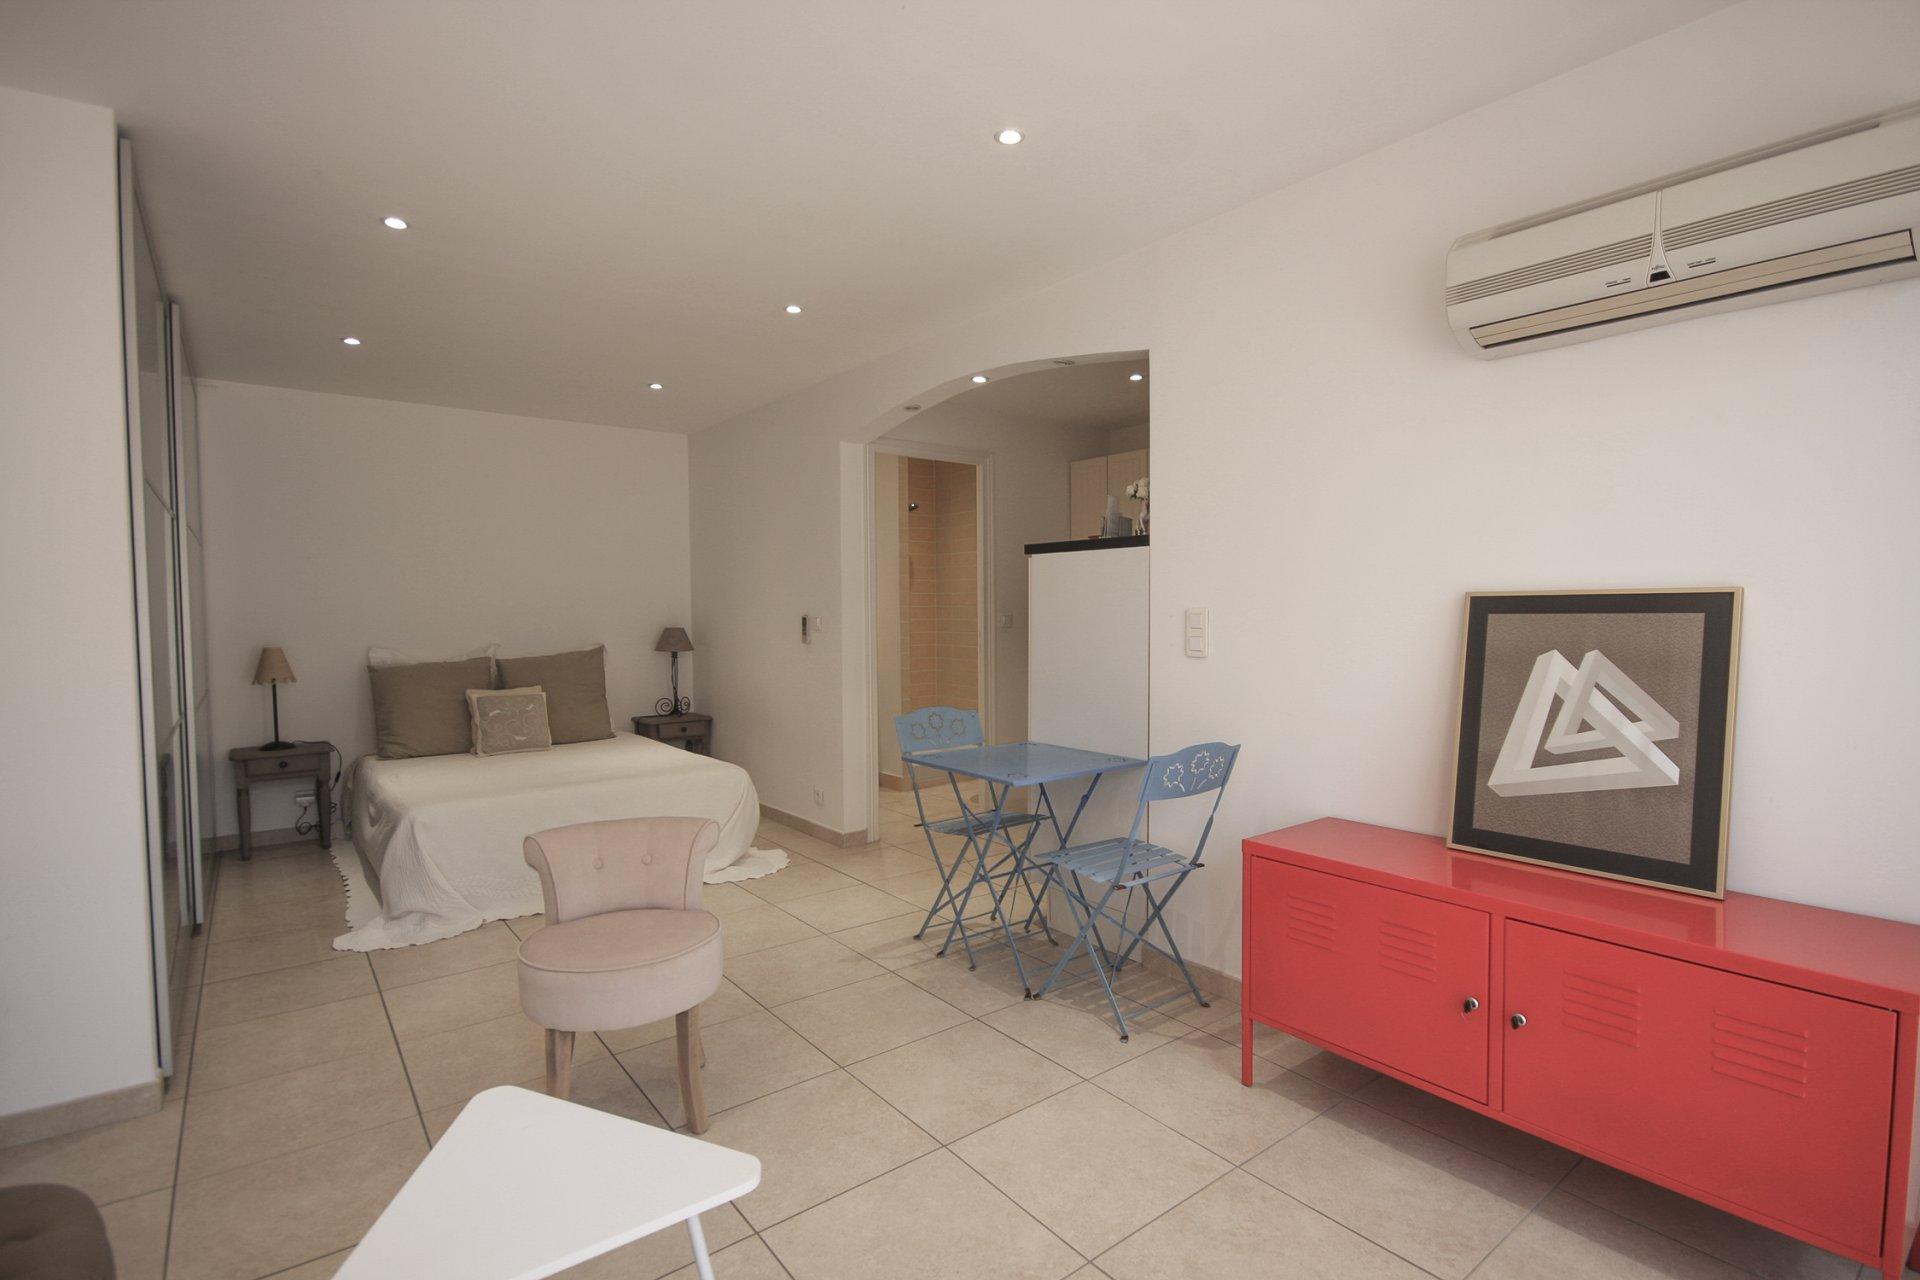 VILLA 5 ROOMS WITH POOL  AT SAINT RAPHAEL